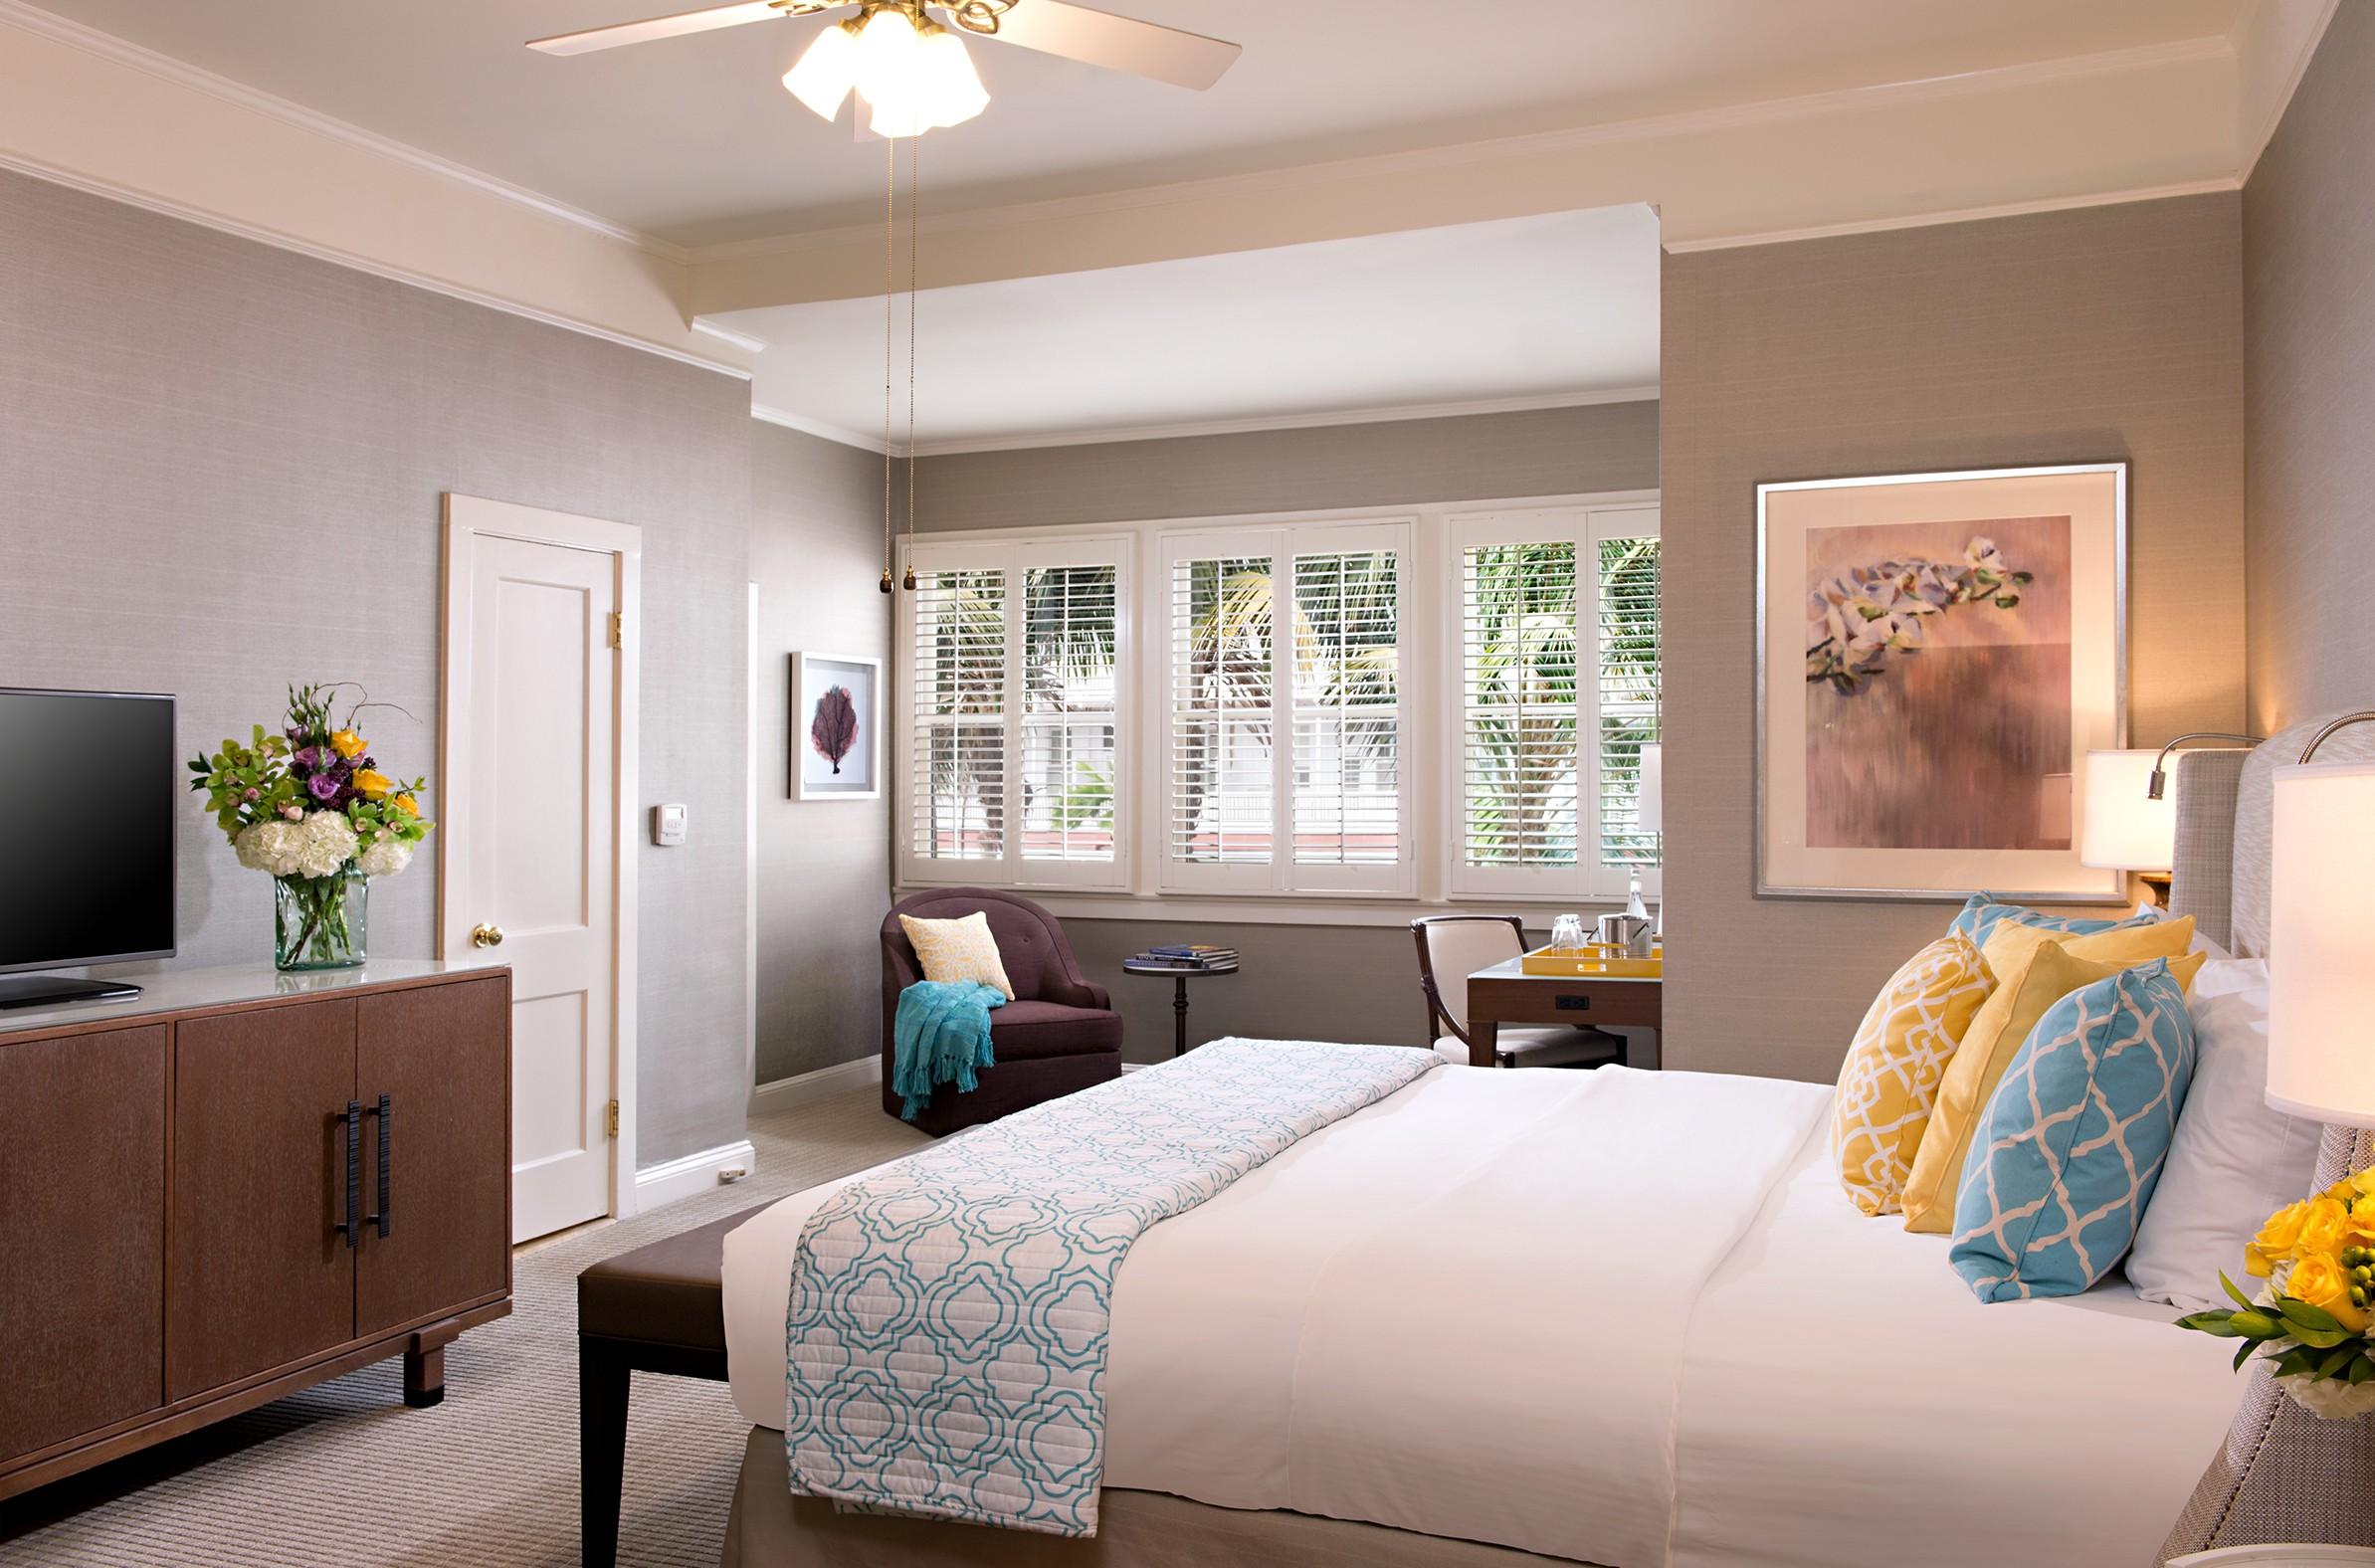 Resort view king room at Hotel Del Coronado.